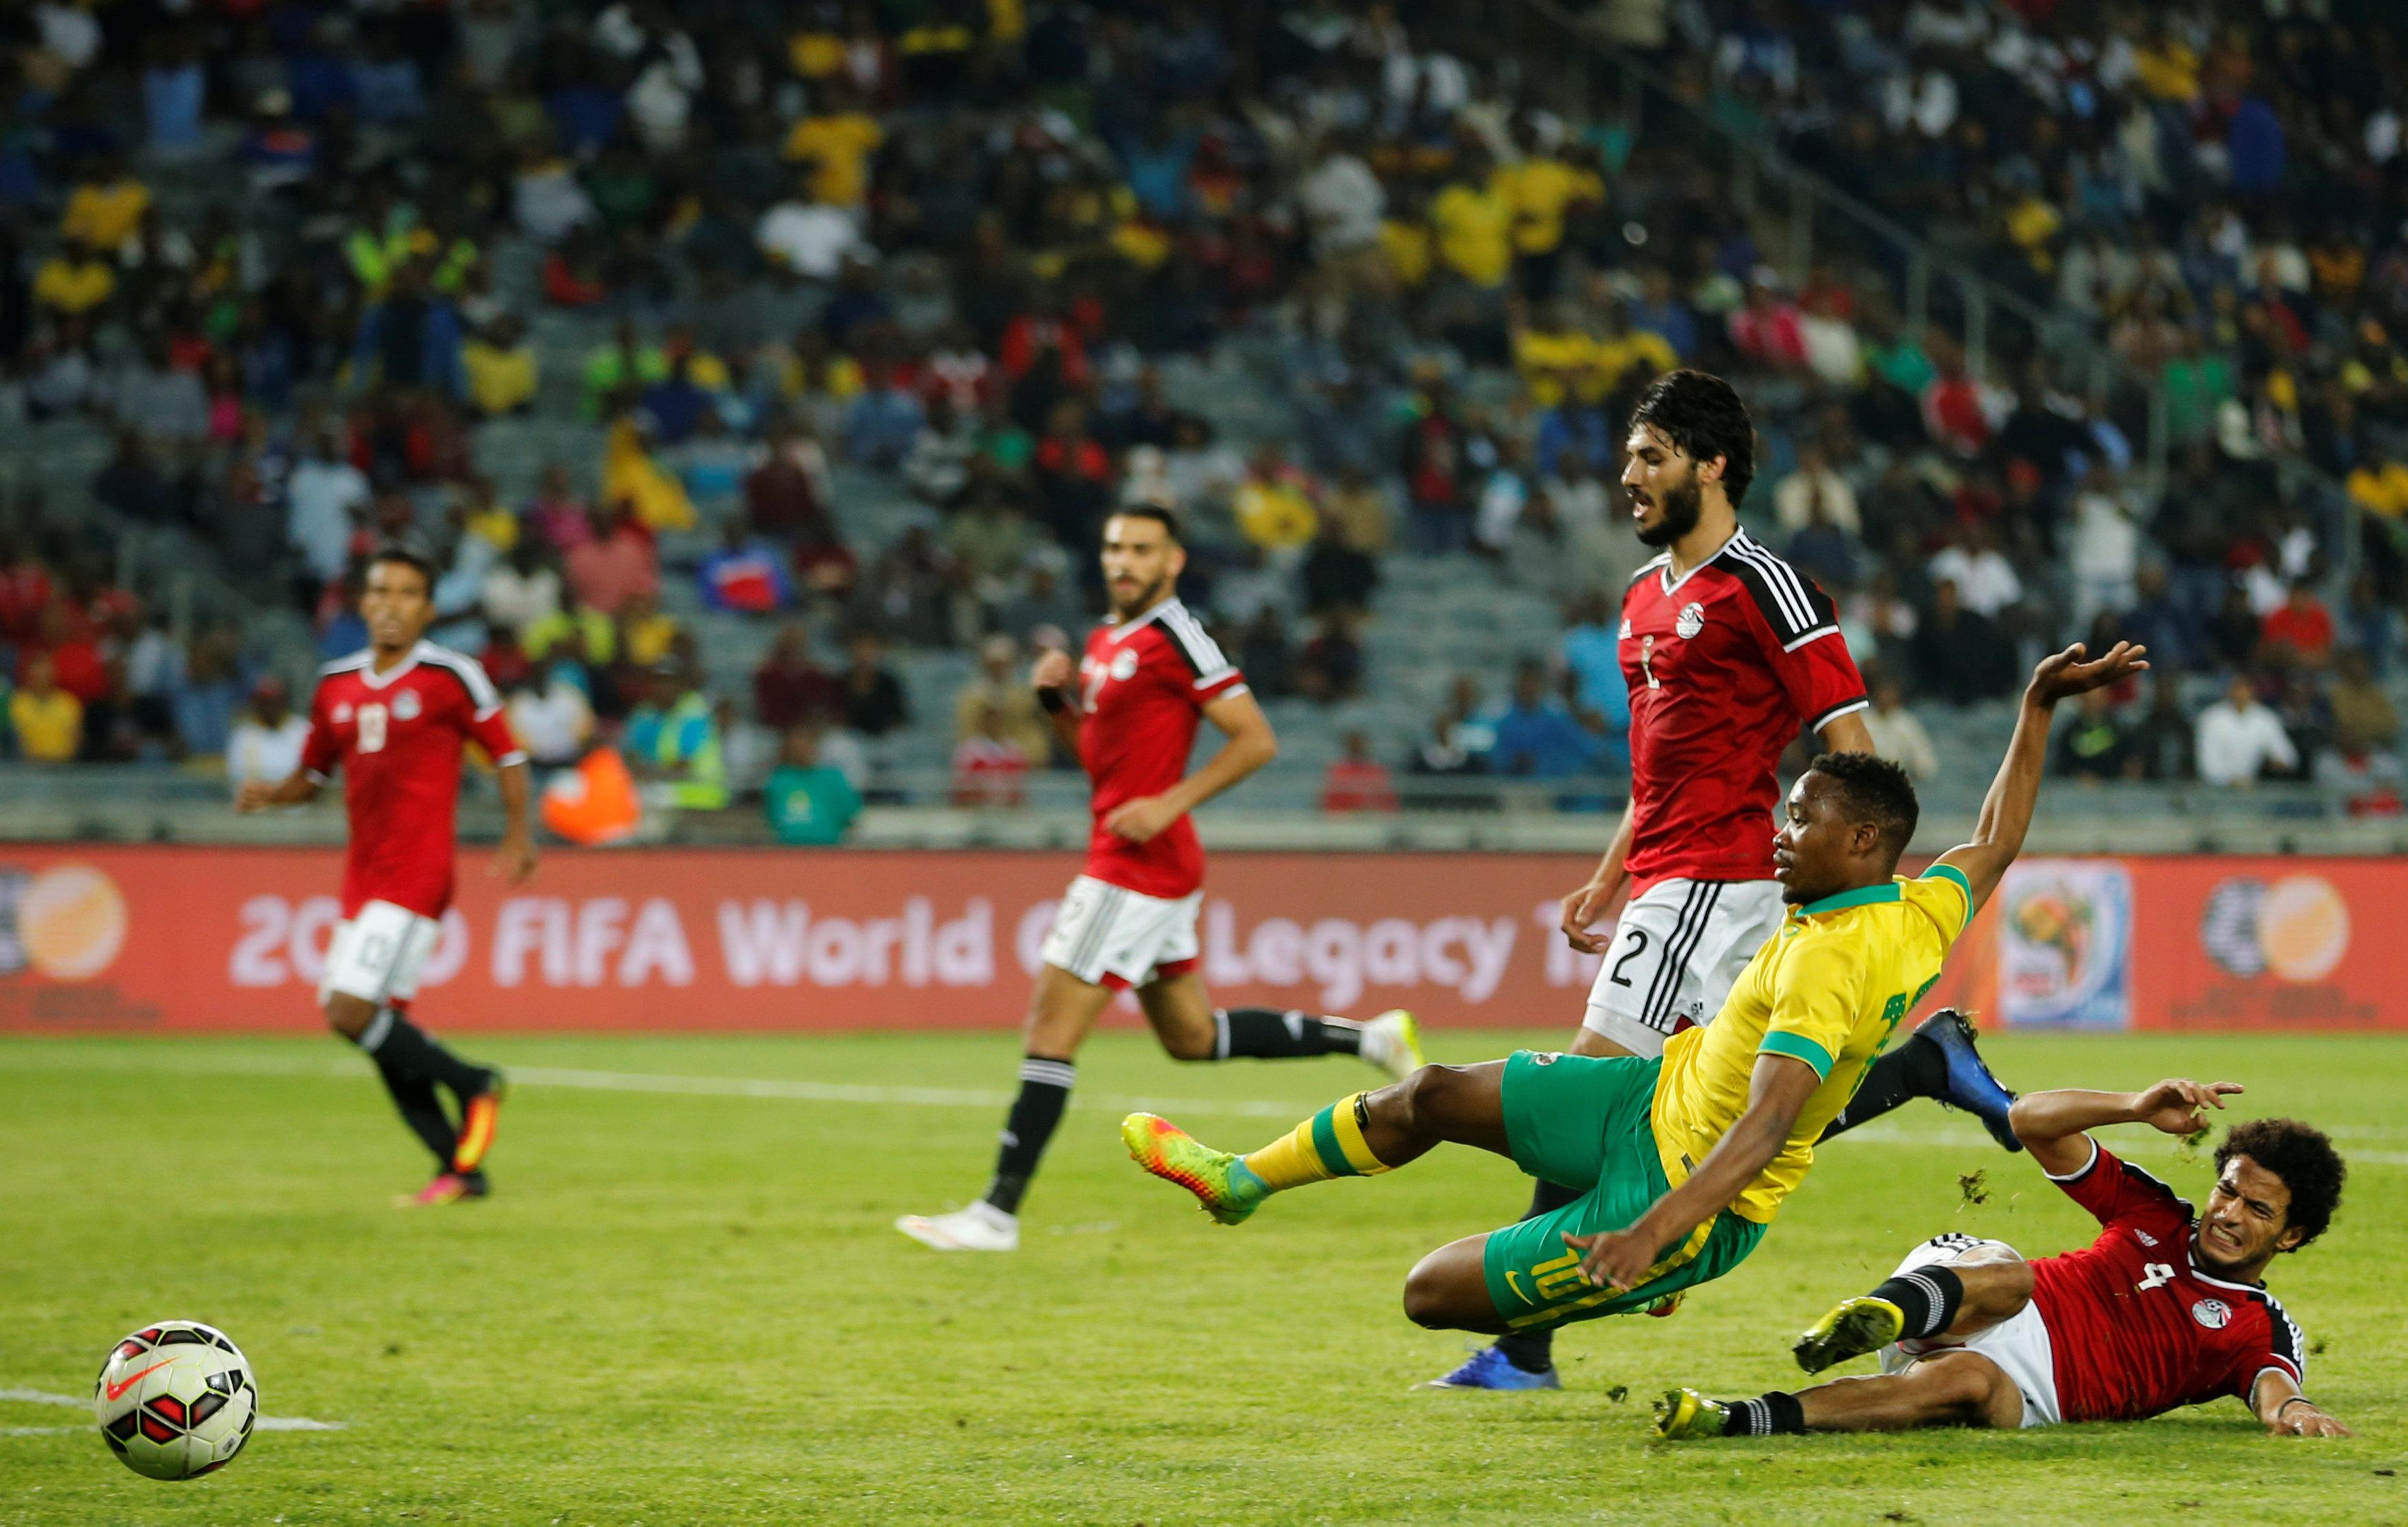 Football Soccer - South Africa v Egypt - Nelson Mandela Challenge soccer match - Orlando Stadium, Soweto, South Africa - 6/9/16 South Africa's Sibusiso Vilakazi (L) is tackled by Egypt's Omar Gaber. REUTERS/Siphiwe Sibeko